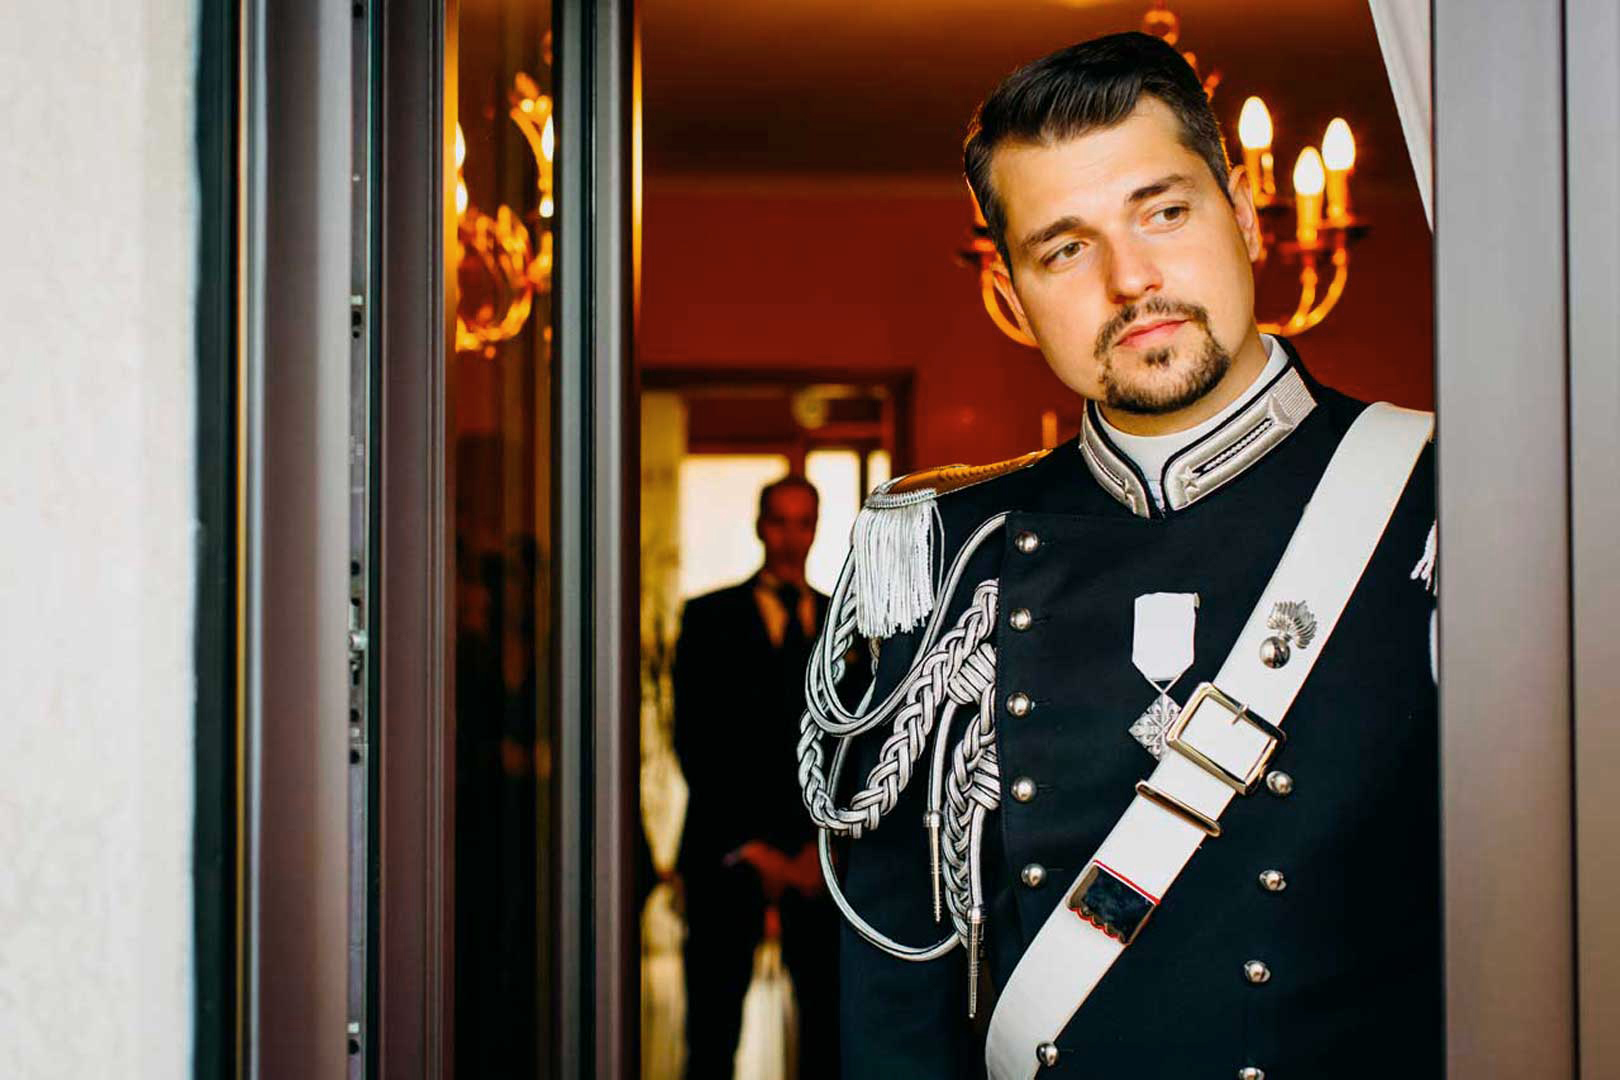 005-sposo-carabiniere-matrimonio-gianni-lepore